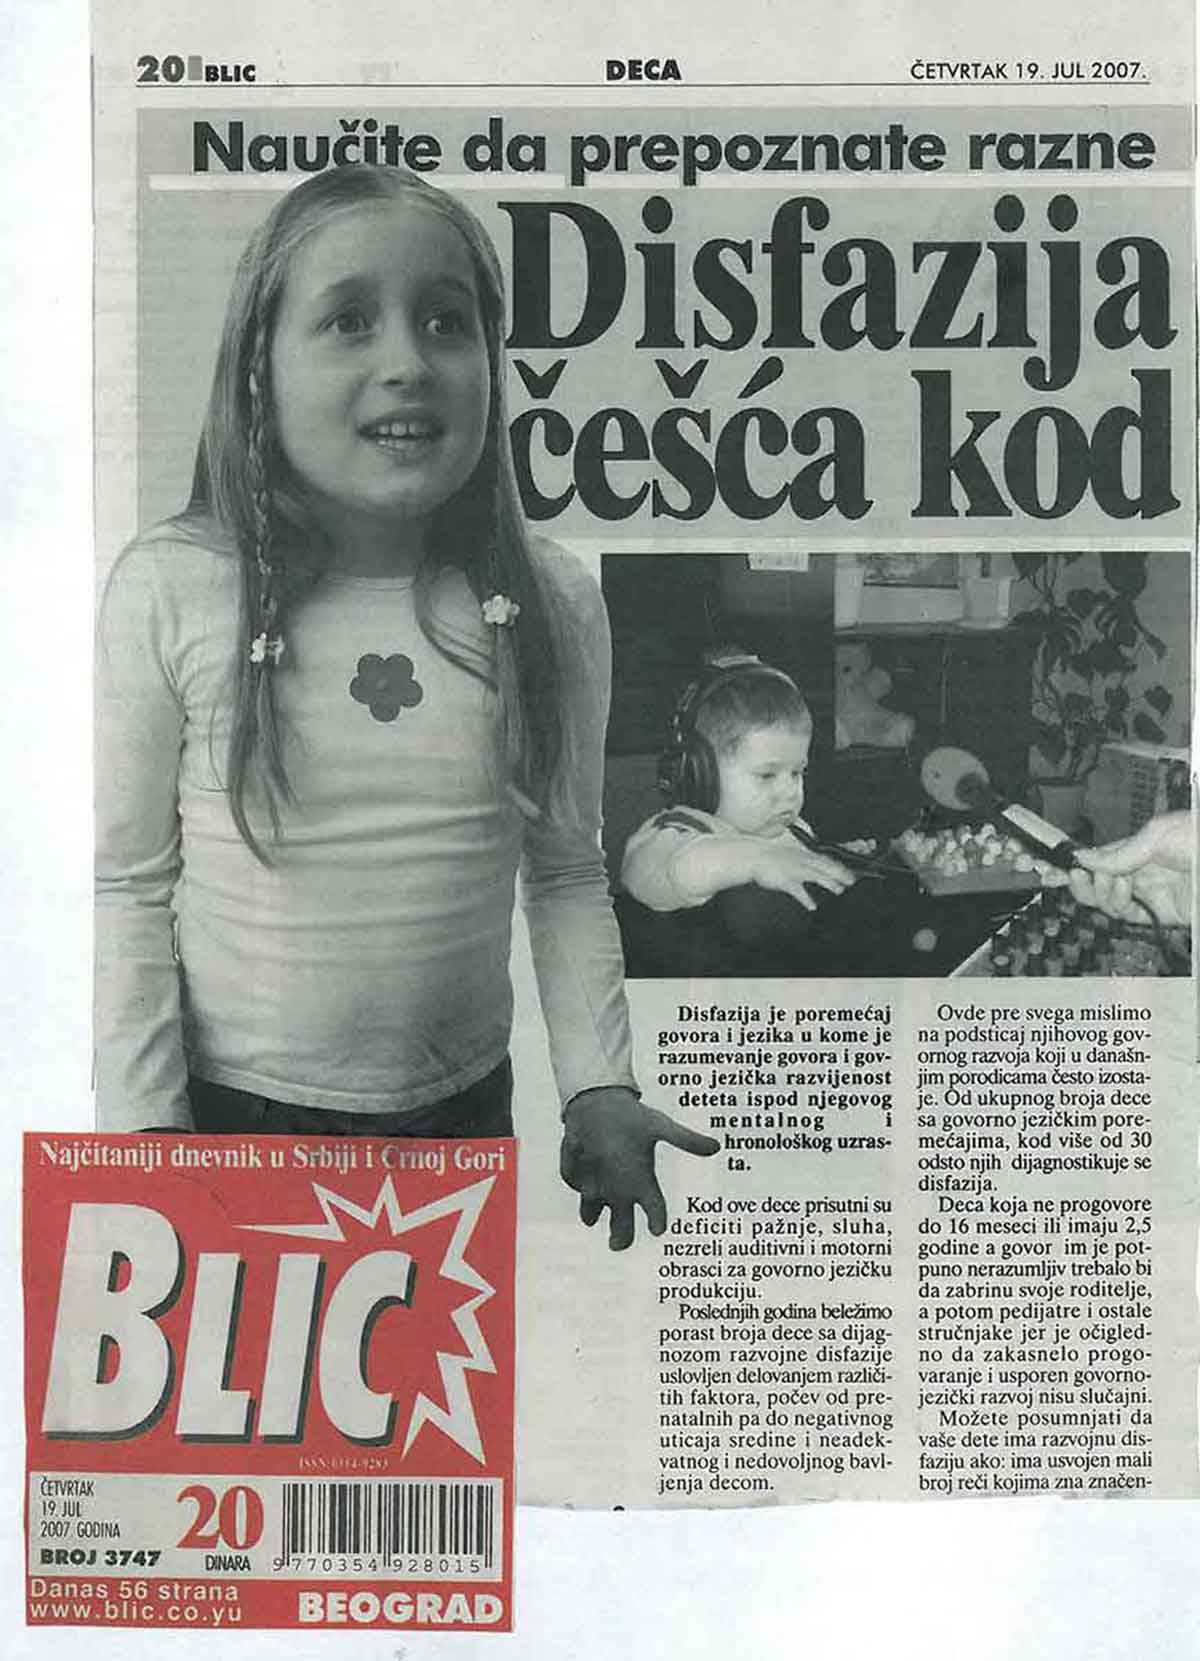 isfazija sve češća – Blic 19.07.2007